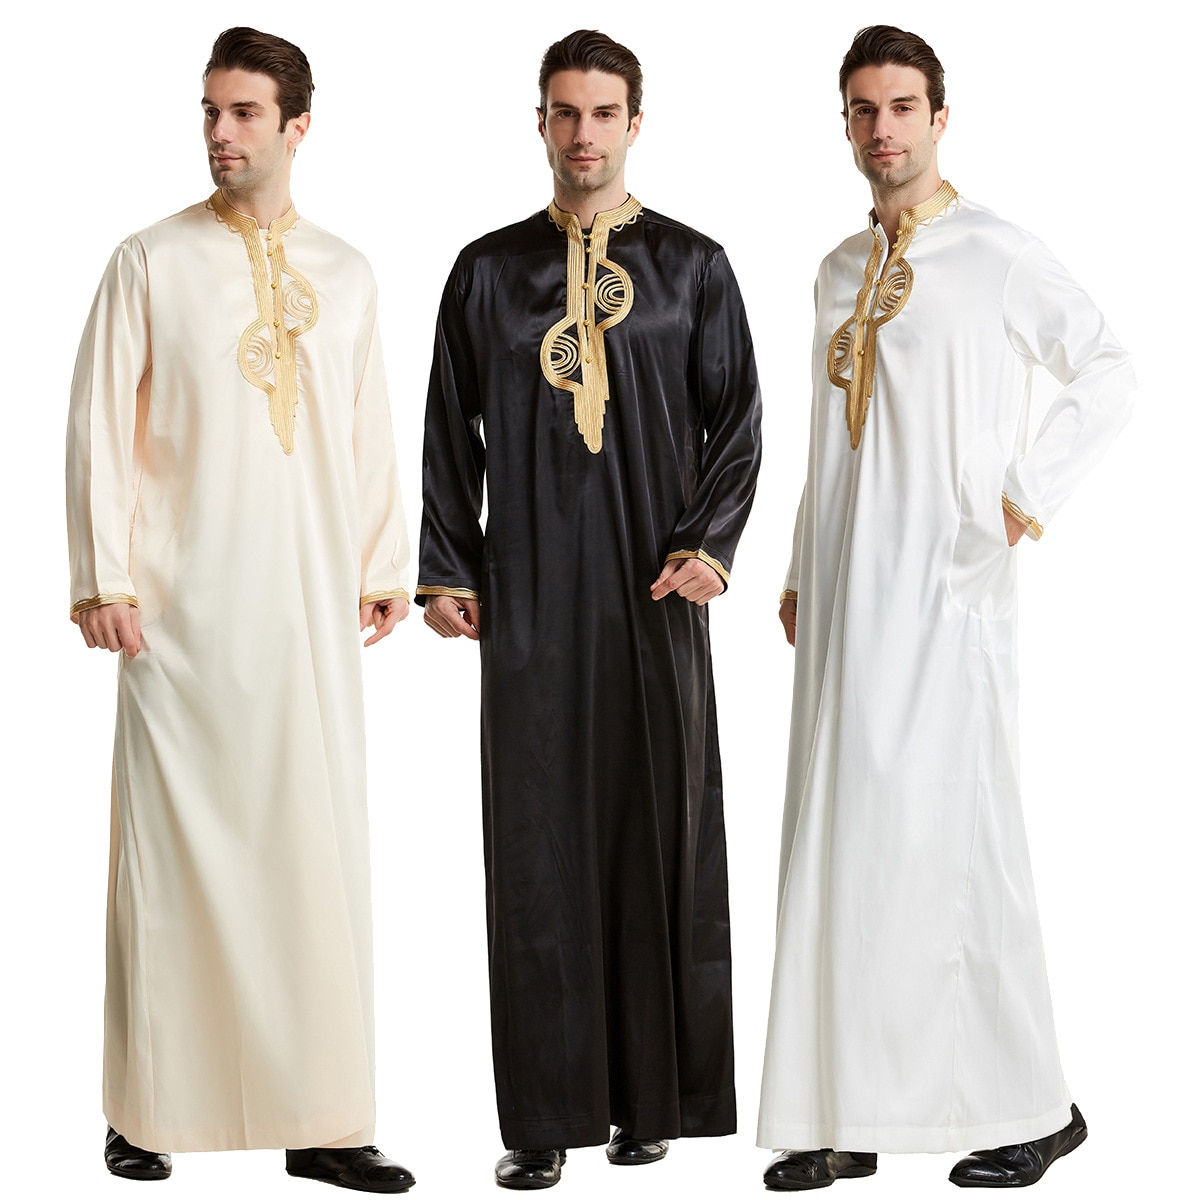 Muslim Men Jubba Thobe Islamic Clothing Stand Collar Kimono Long Robe Saudi Musulman Wear Abaya Caftan Jubah Dubai Arab Dressing